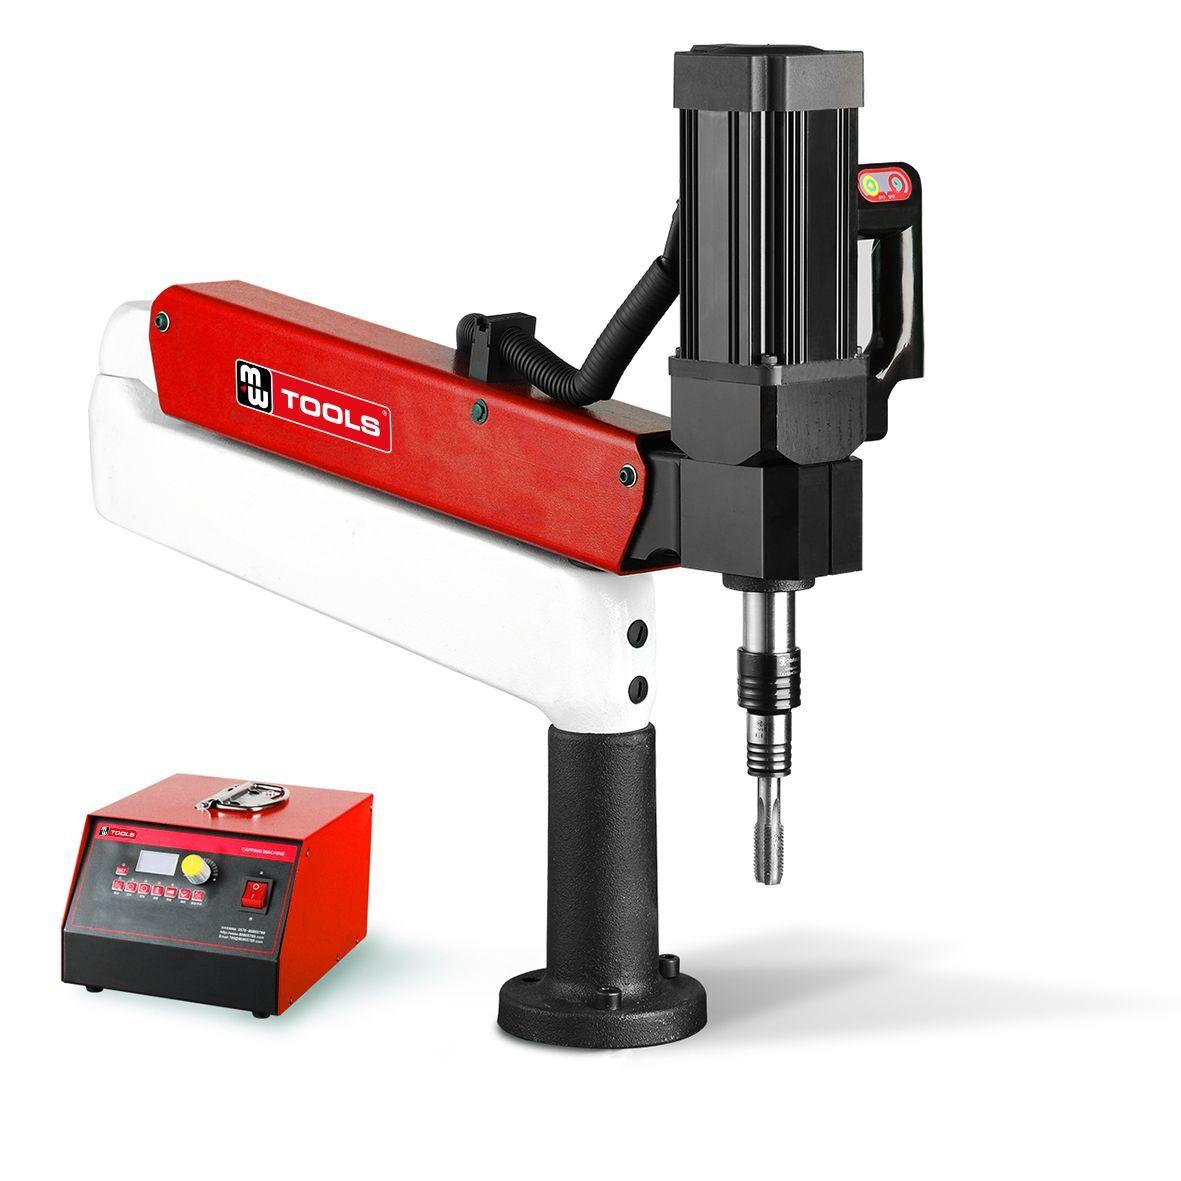 Mw-tools Bras de taraudage électrique M2-M12 230V 1,2kW + 6 douilles MW-Tools ETA12915